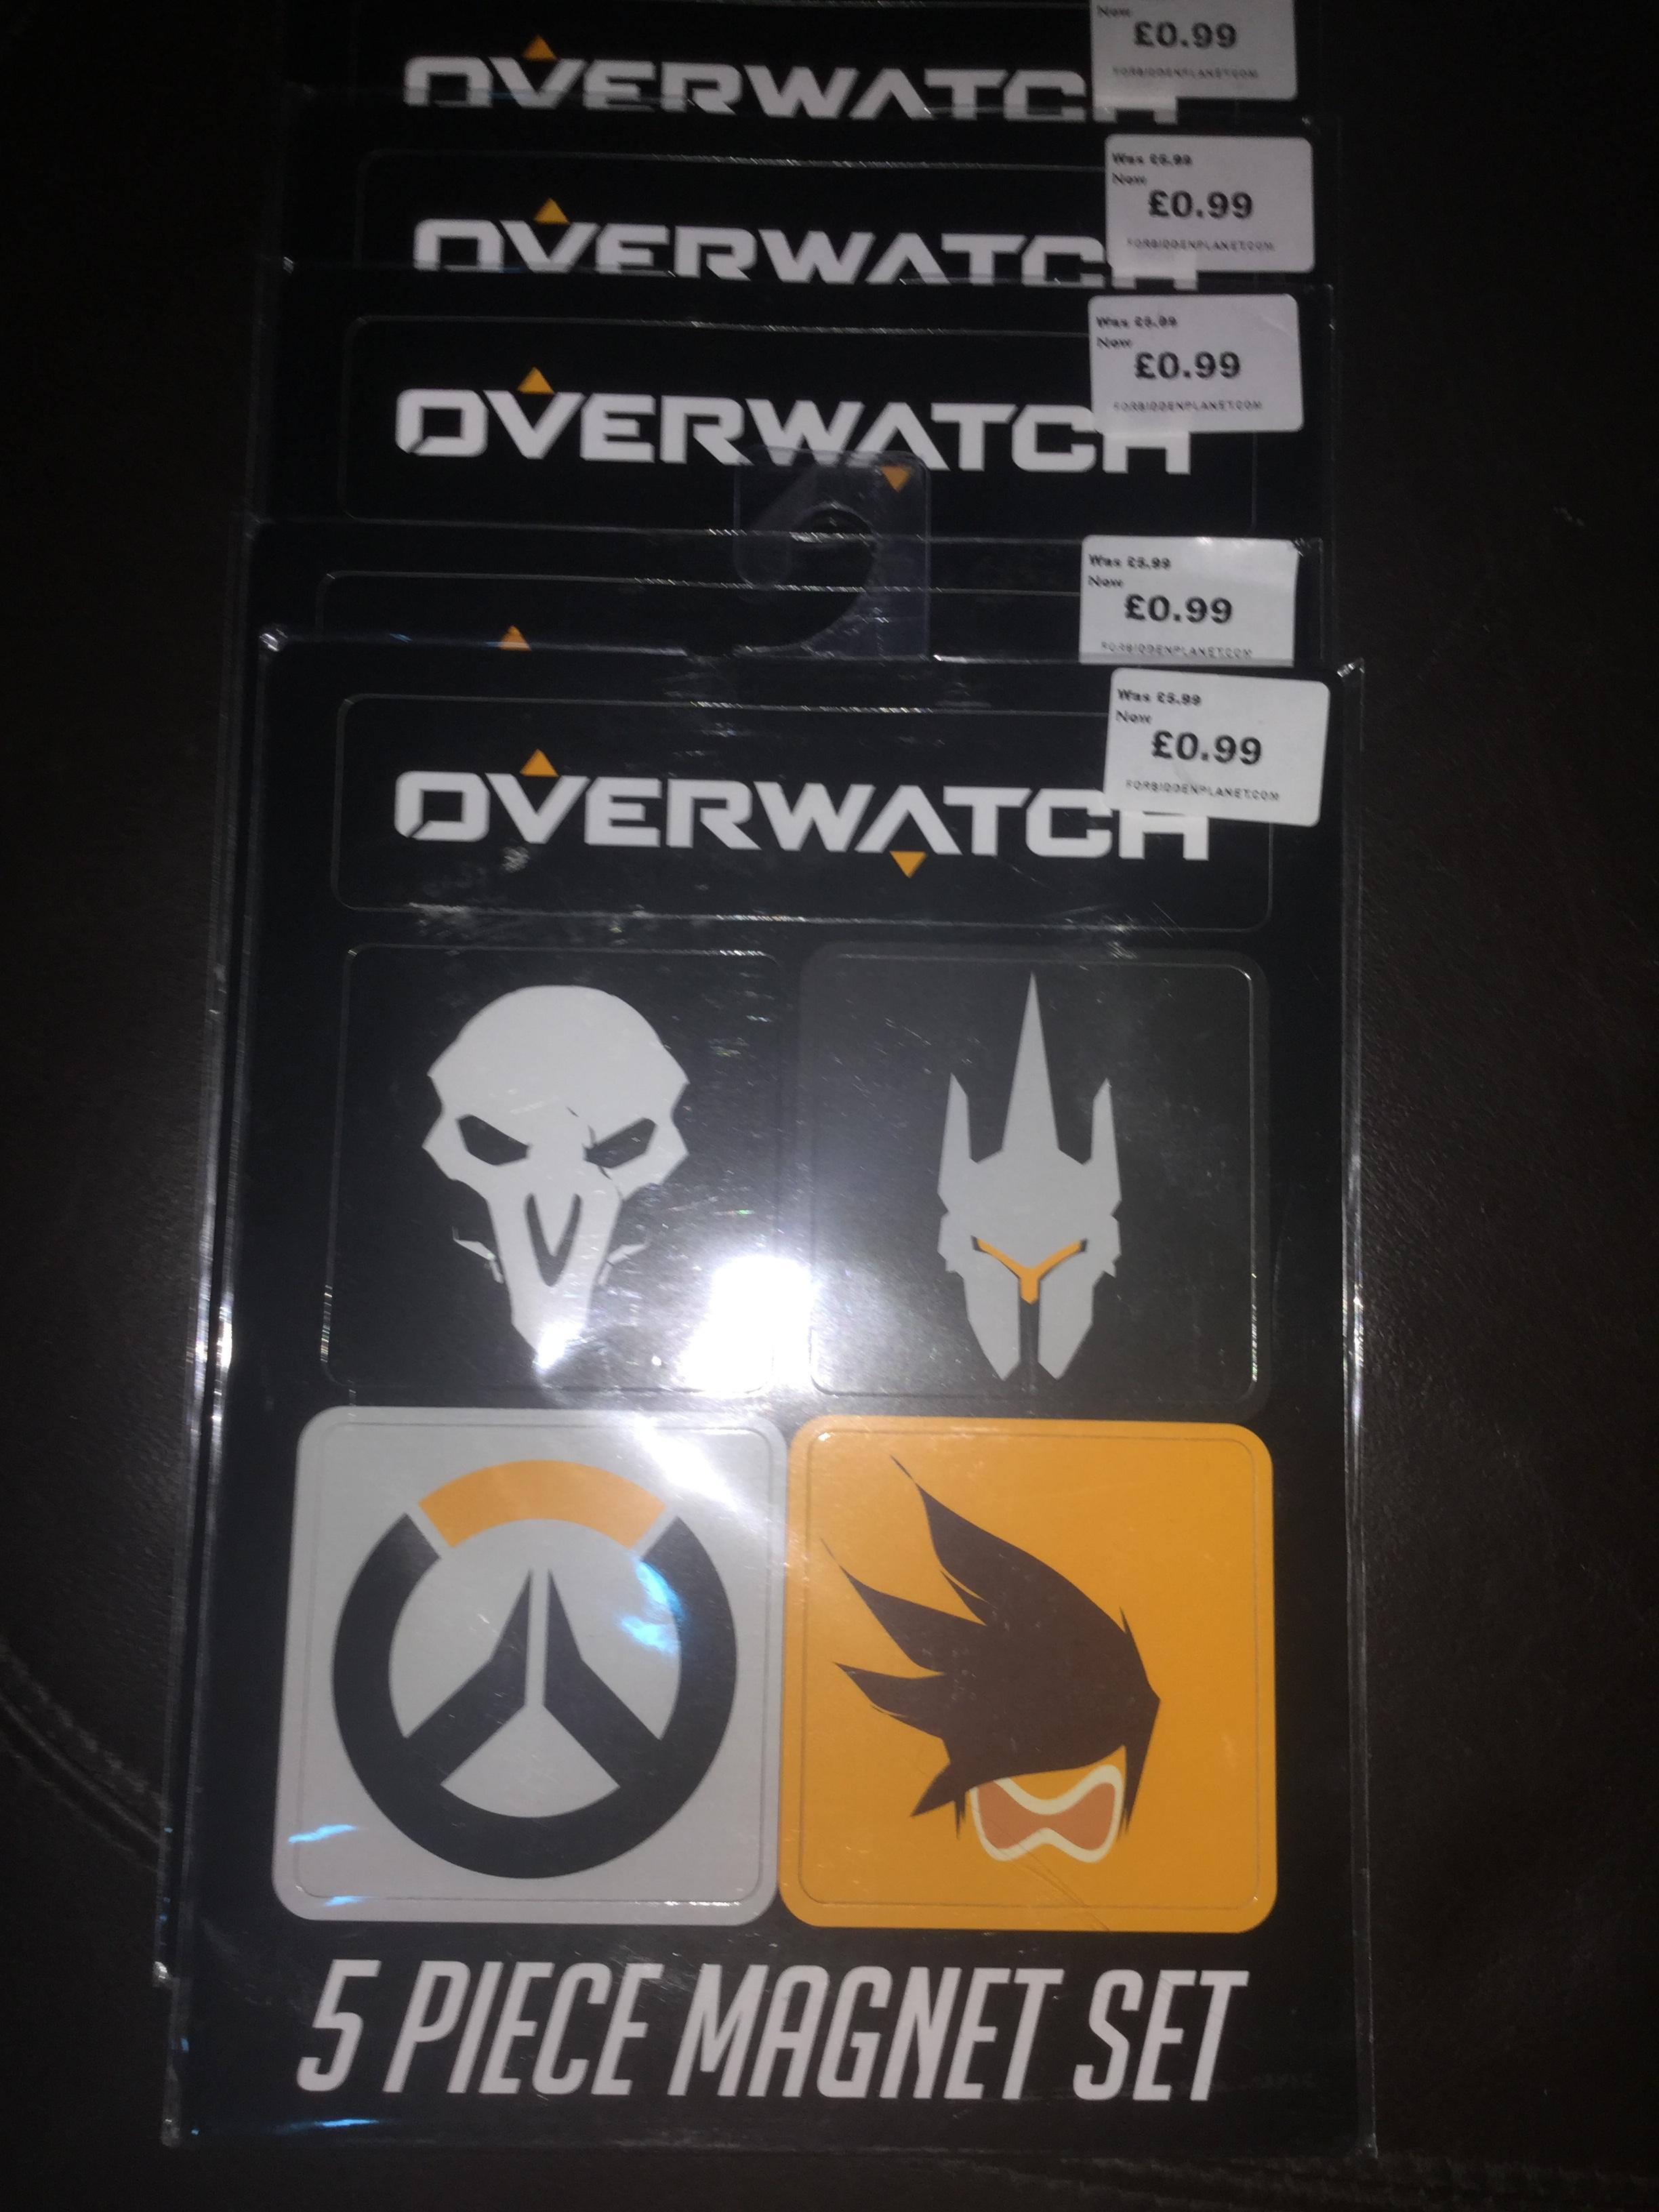 Overwatch 5 piece magnet set now 99p was £5.99 @ Forbidden Planet instore